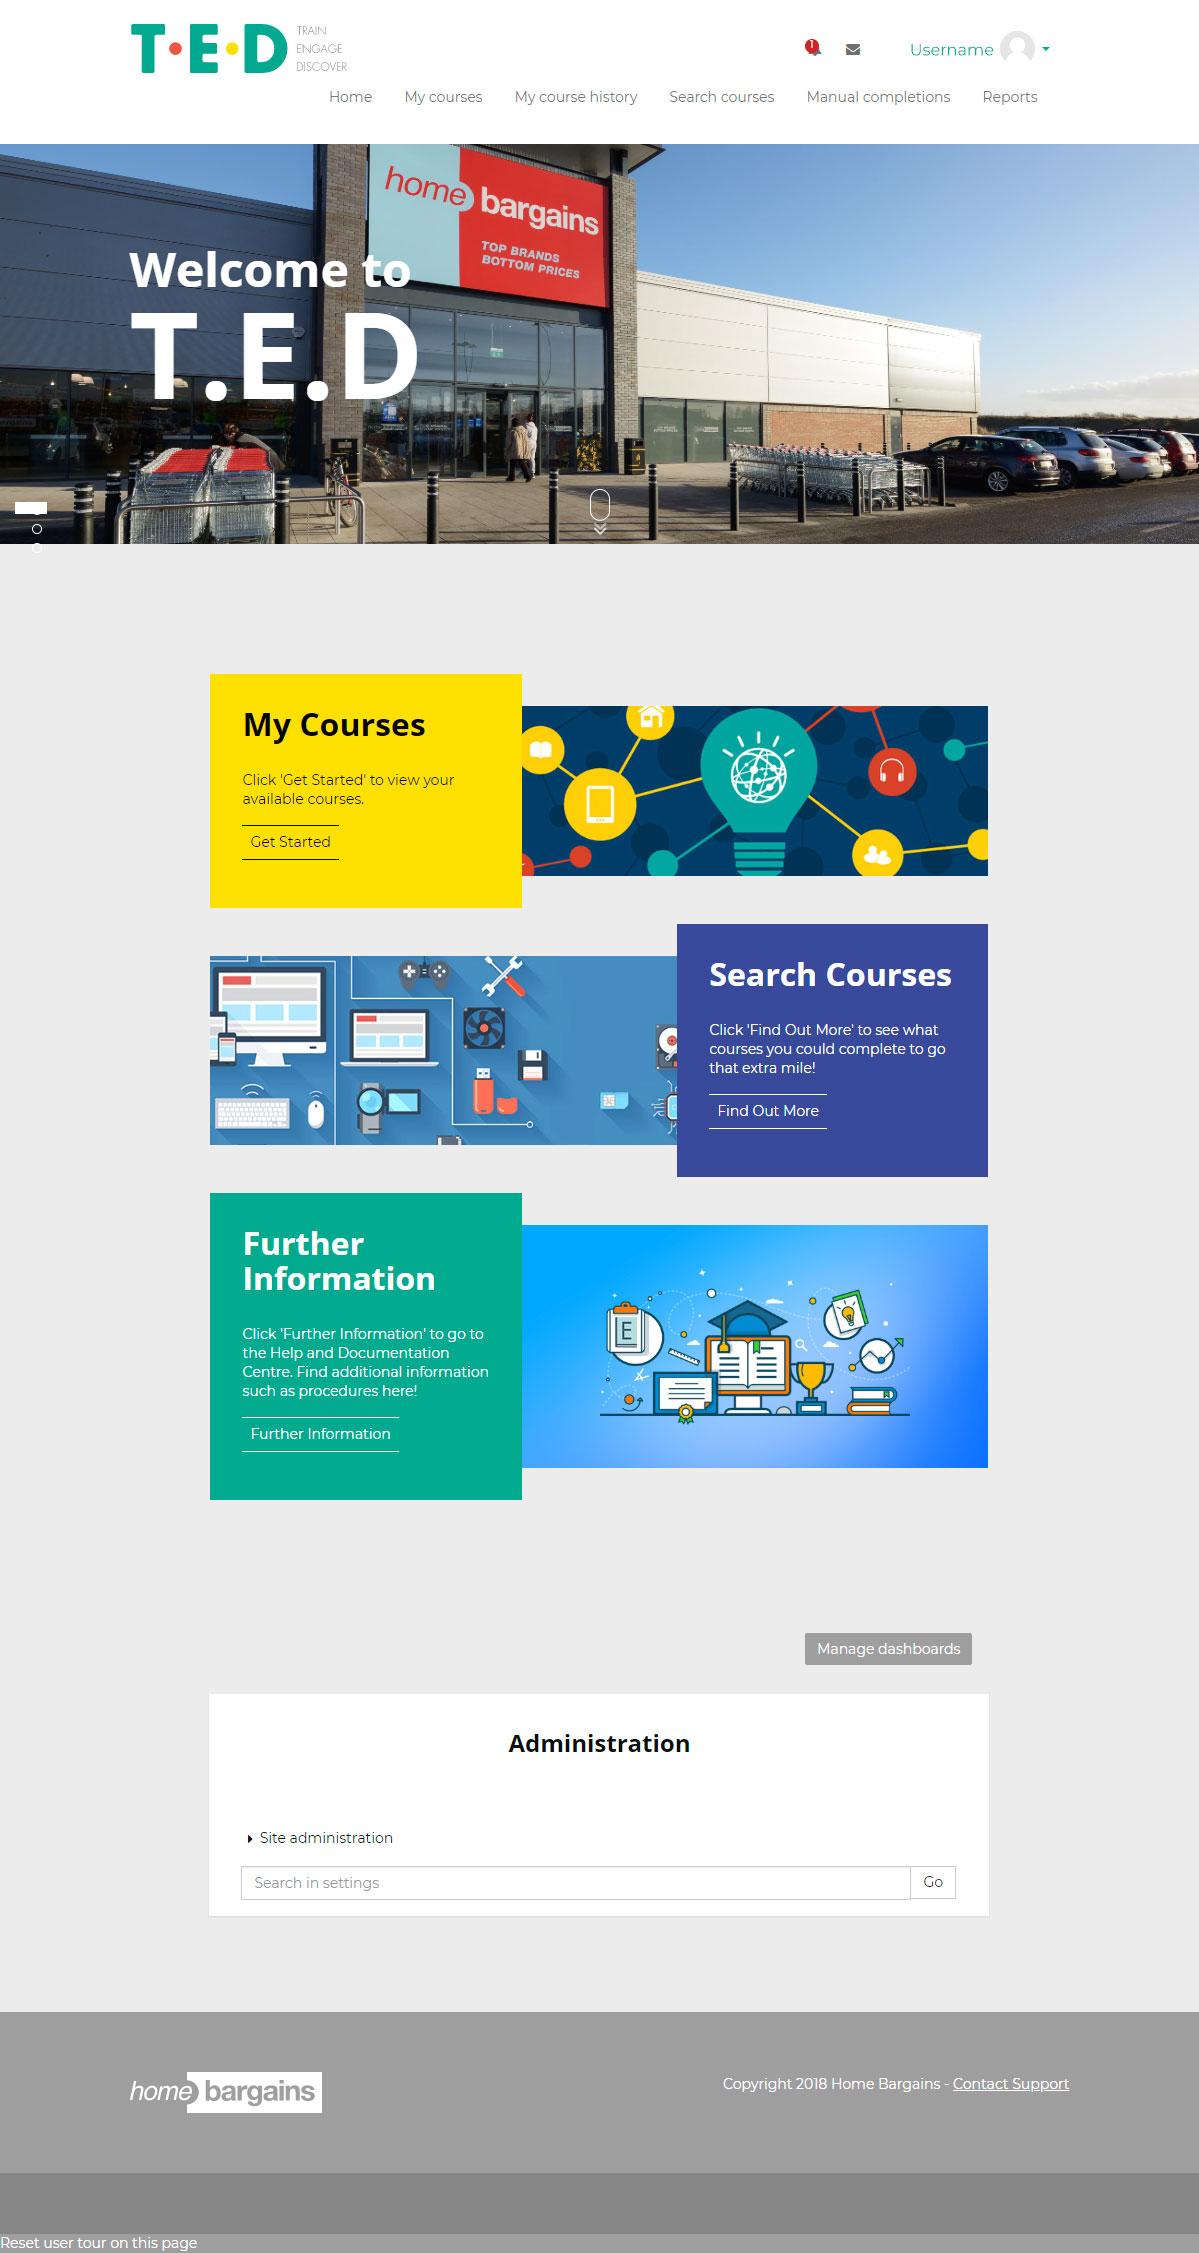 Design It - TJ Morris - Desktop